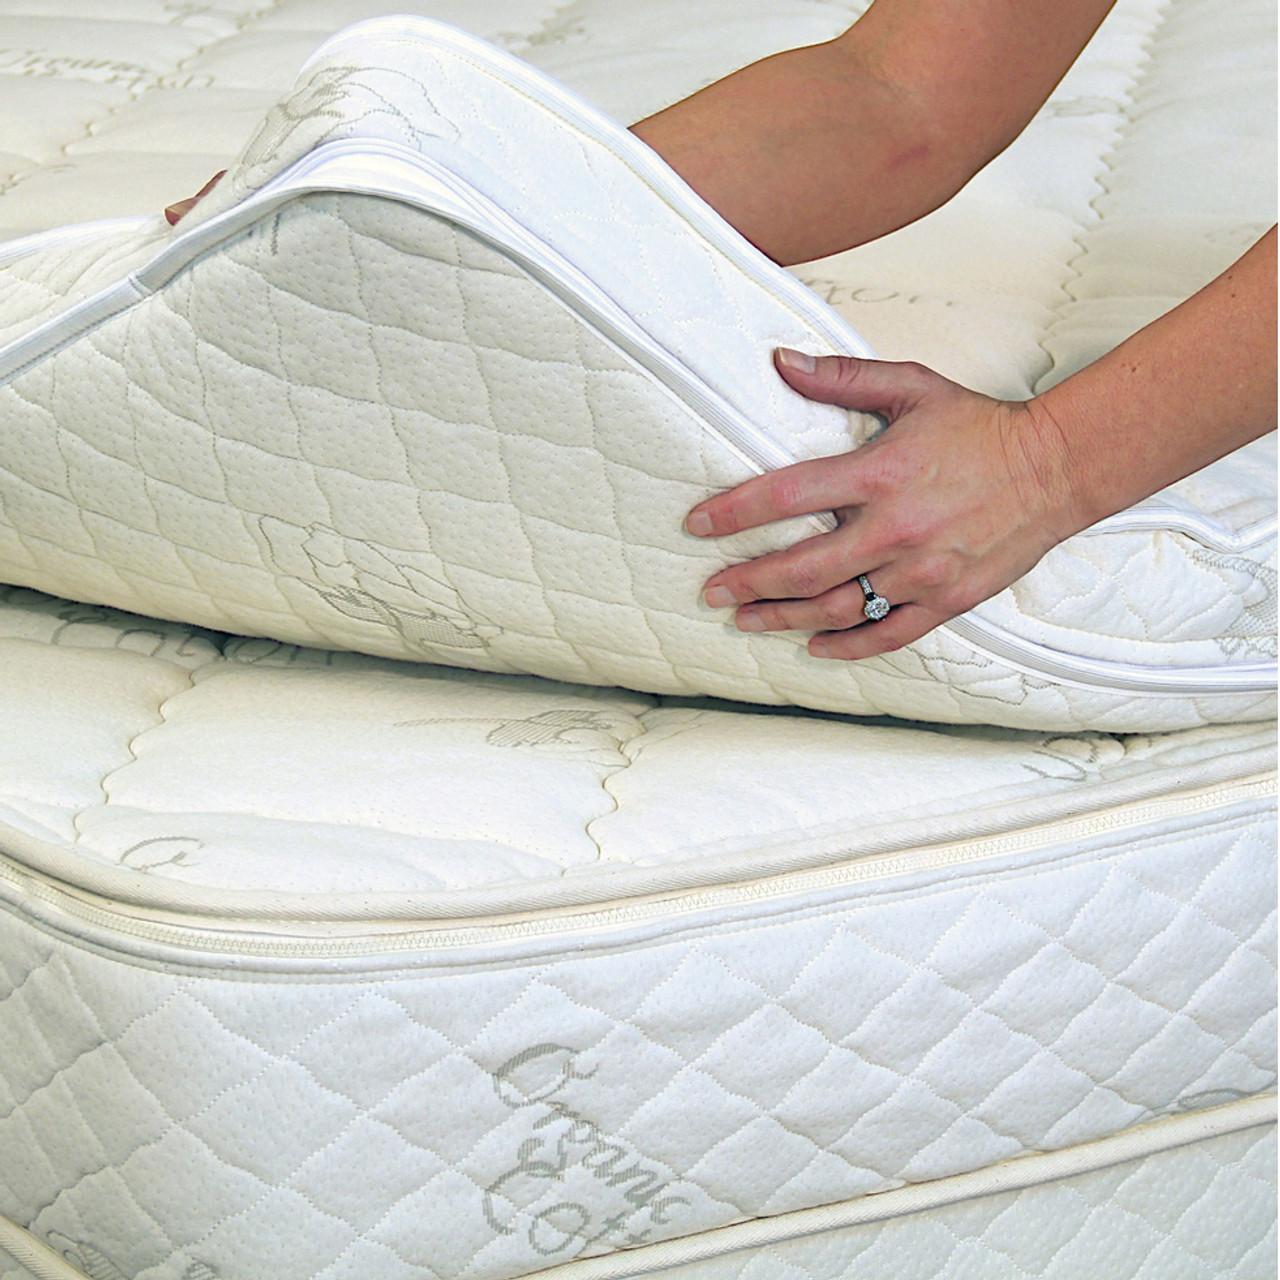 Sleep Ez topper reviews: Features